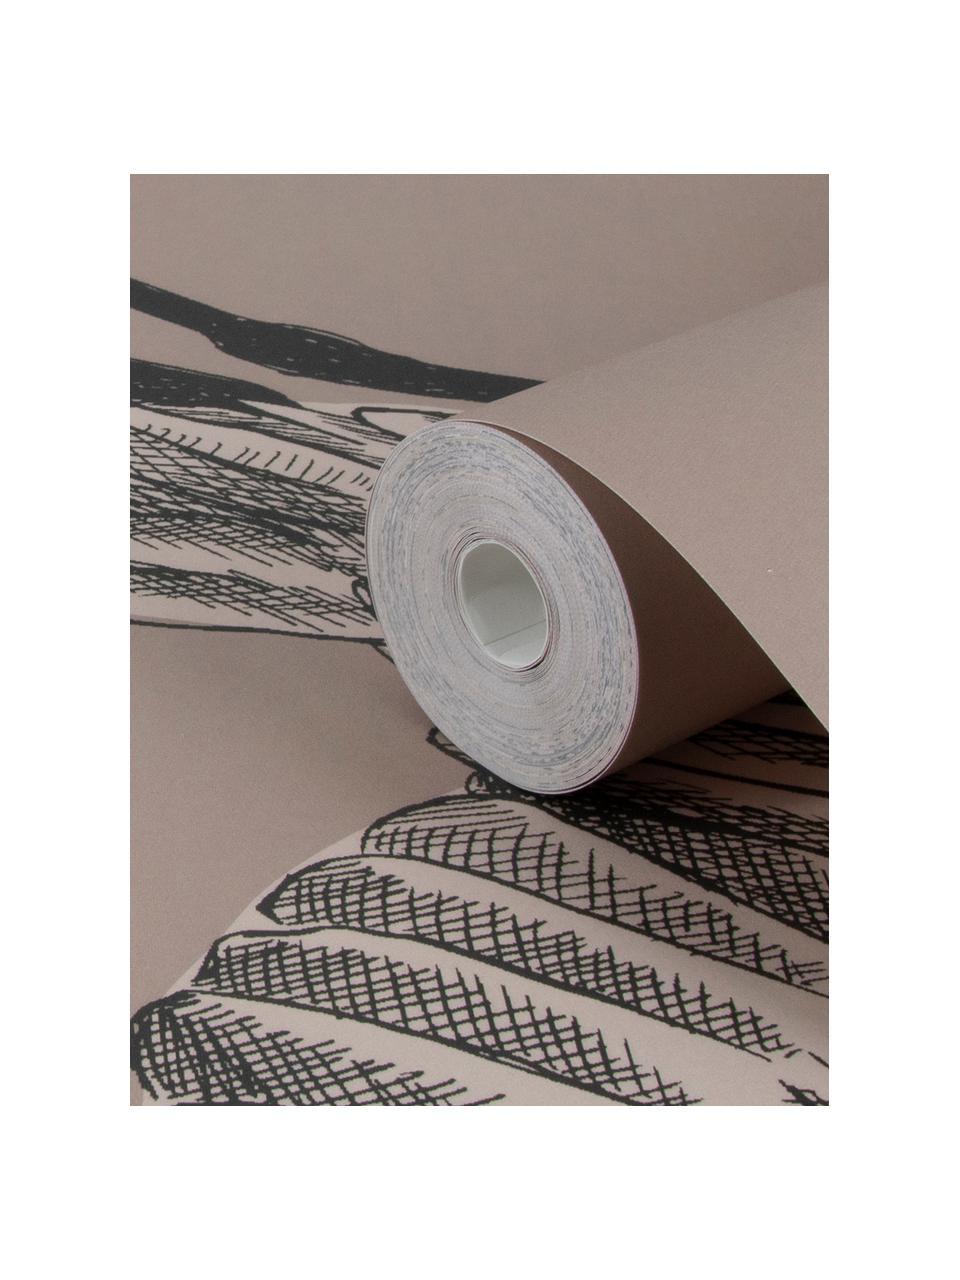 Fototapete Graphic Nature, Vlies, Rosa, Beige, Grau, 300 x 280 cm